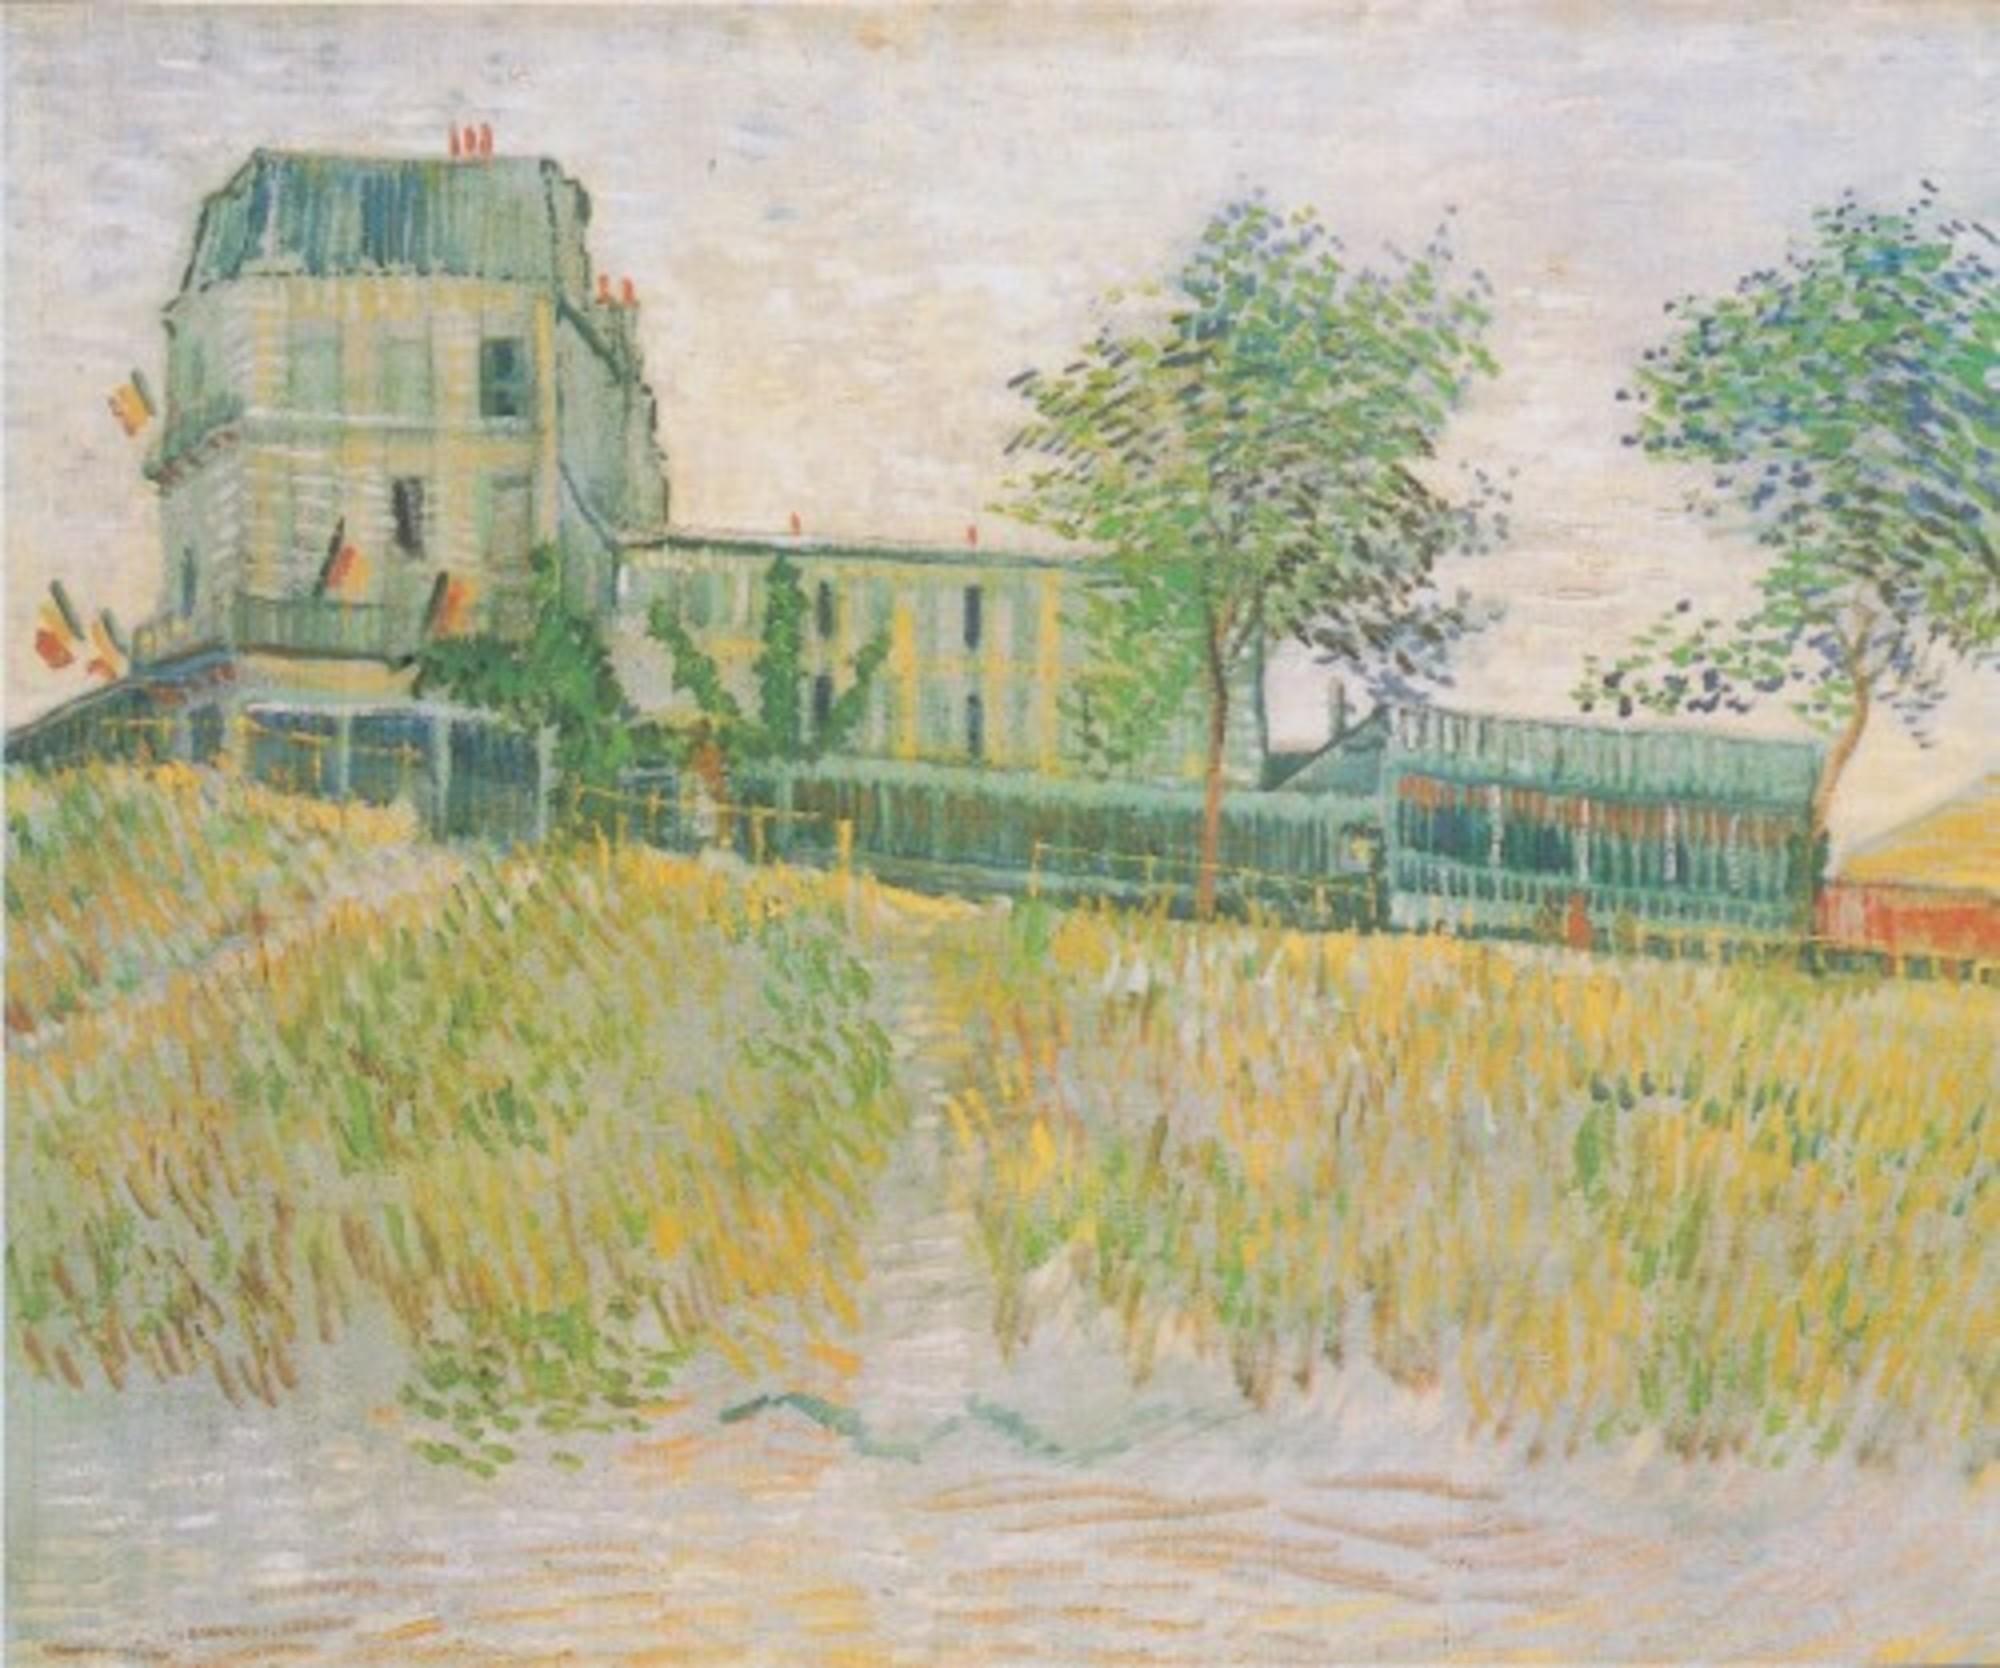 Van-Gogh---Das-Restaurant-de-la-Sirene-in-Asnieres.jpg